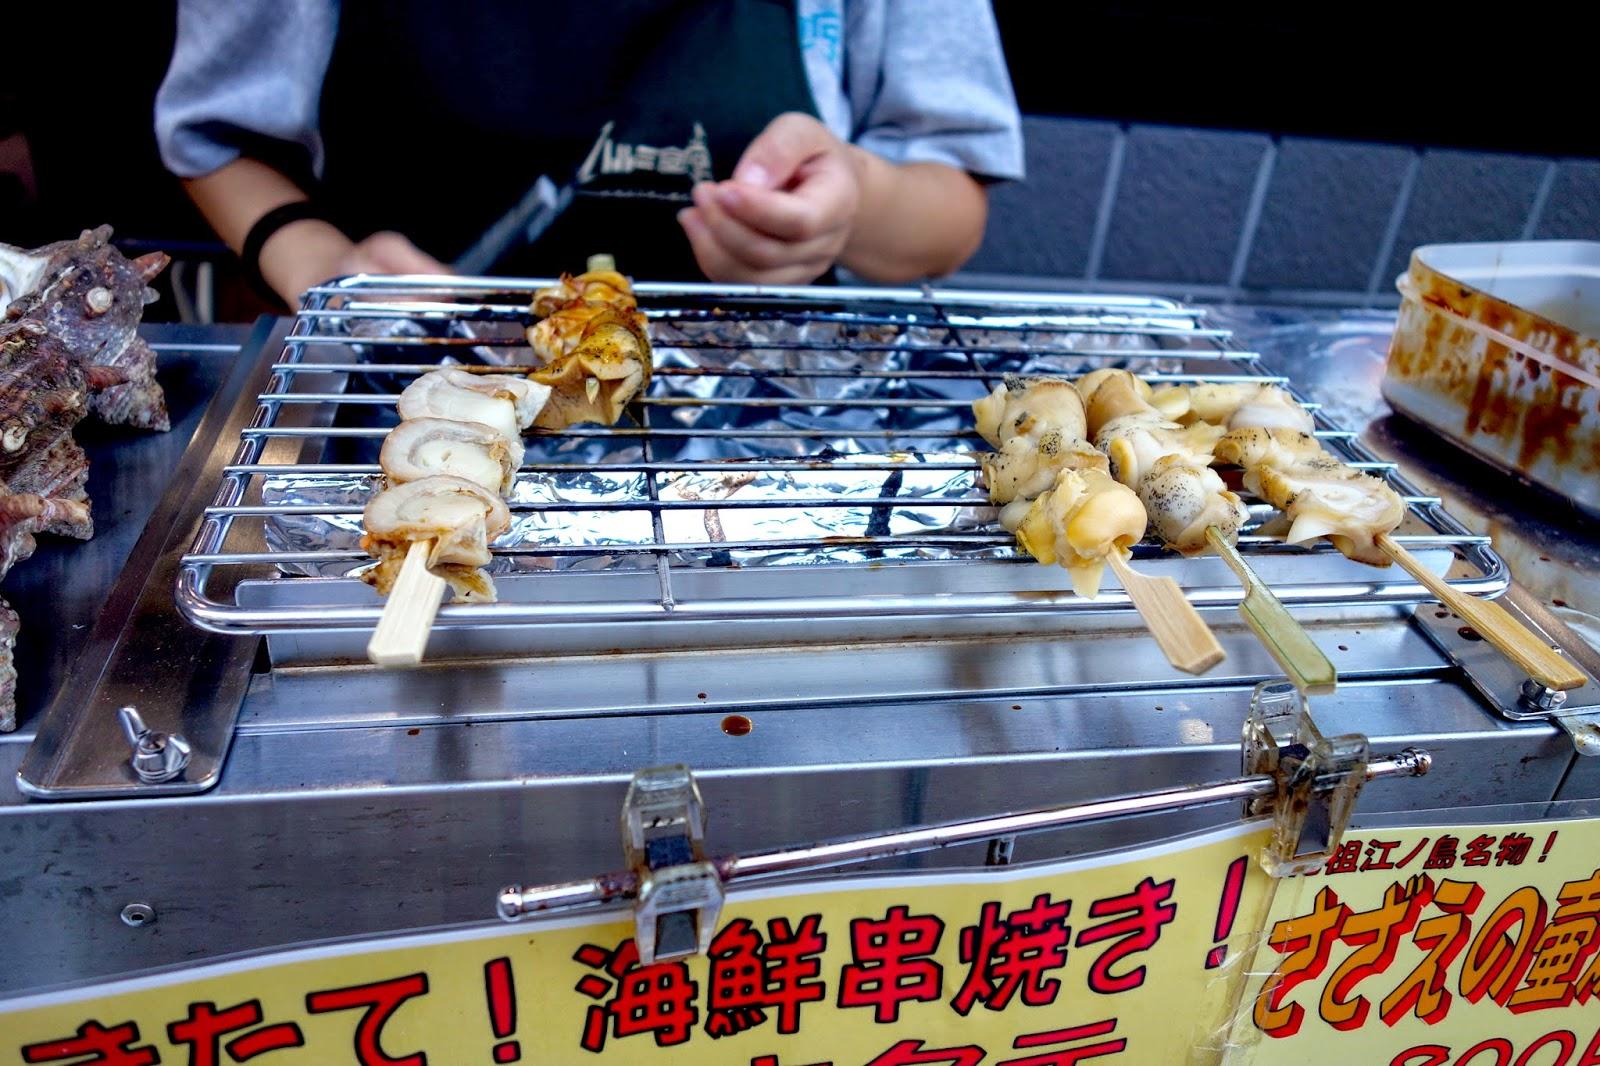 Kamakura Day trip Sep Enoshima seafood hotate